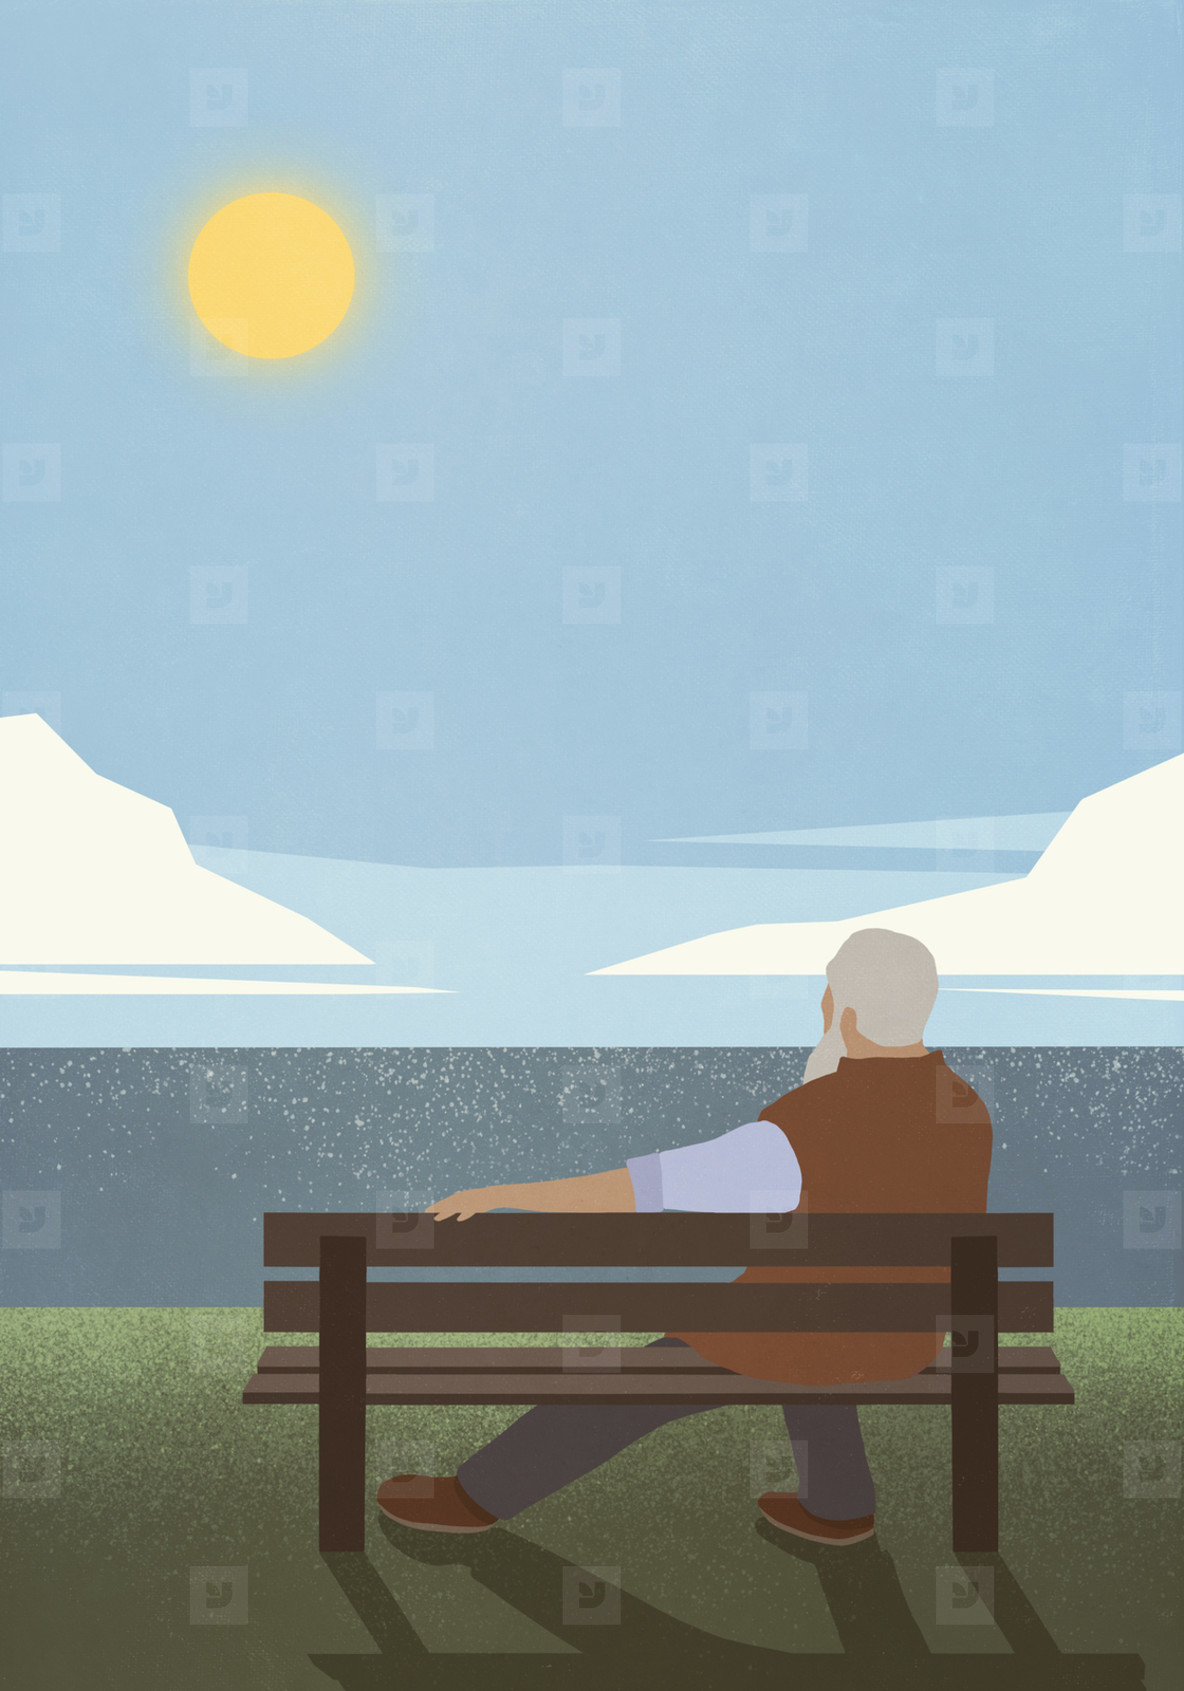 Serene senior man on bench enjoying idyllic sunny lake view